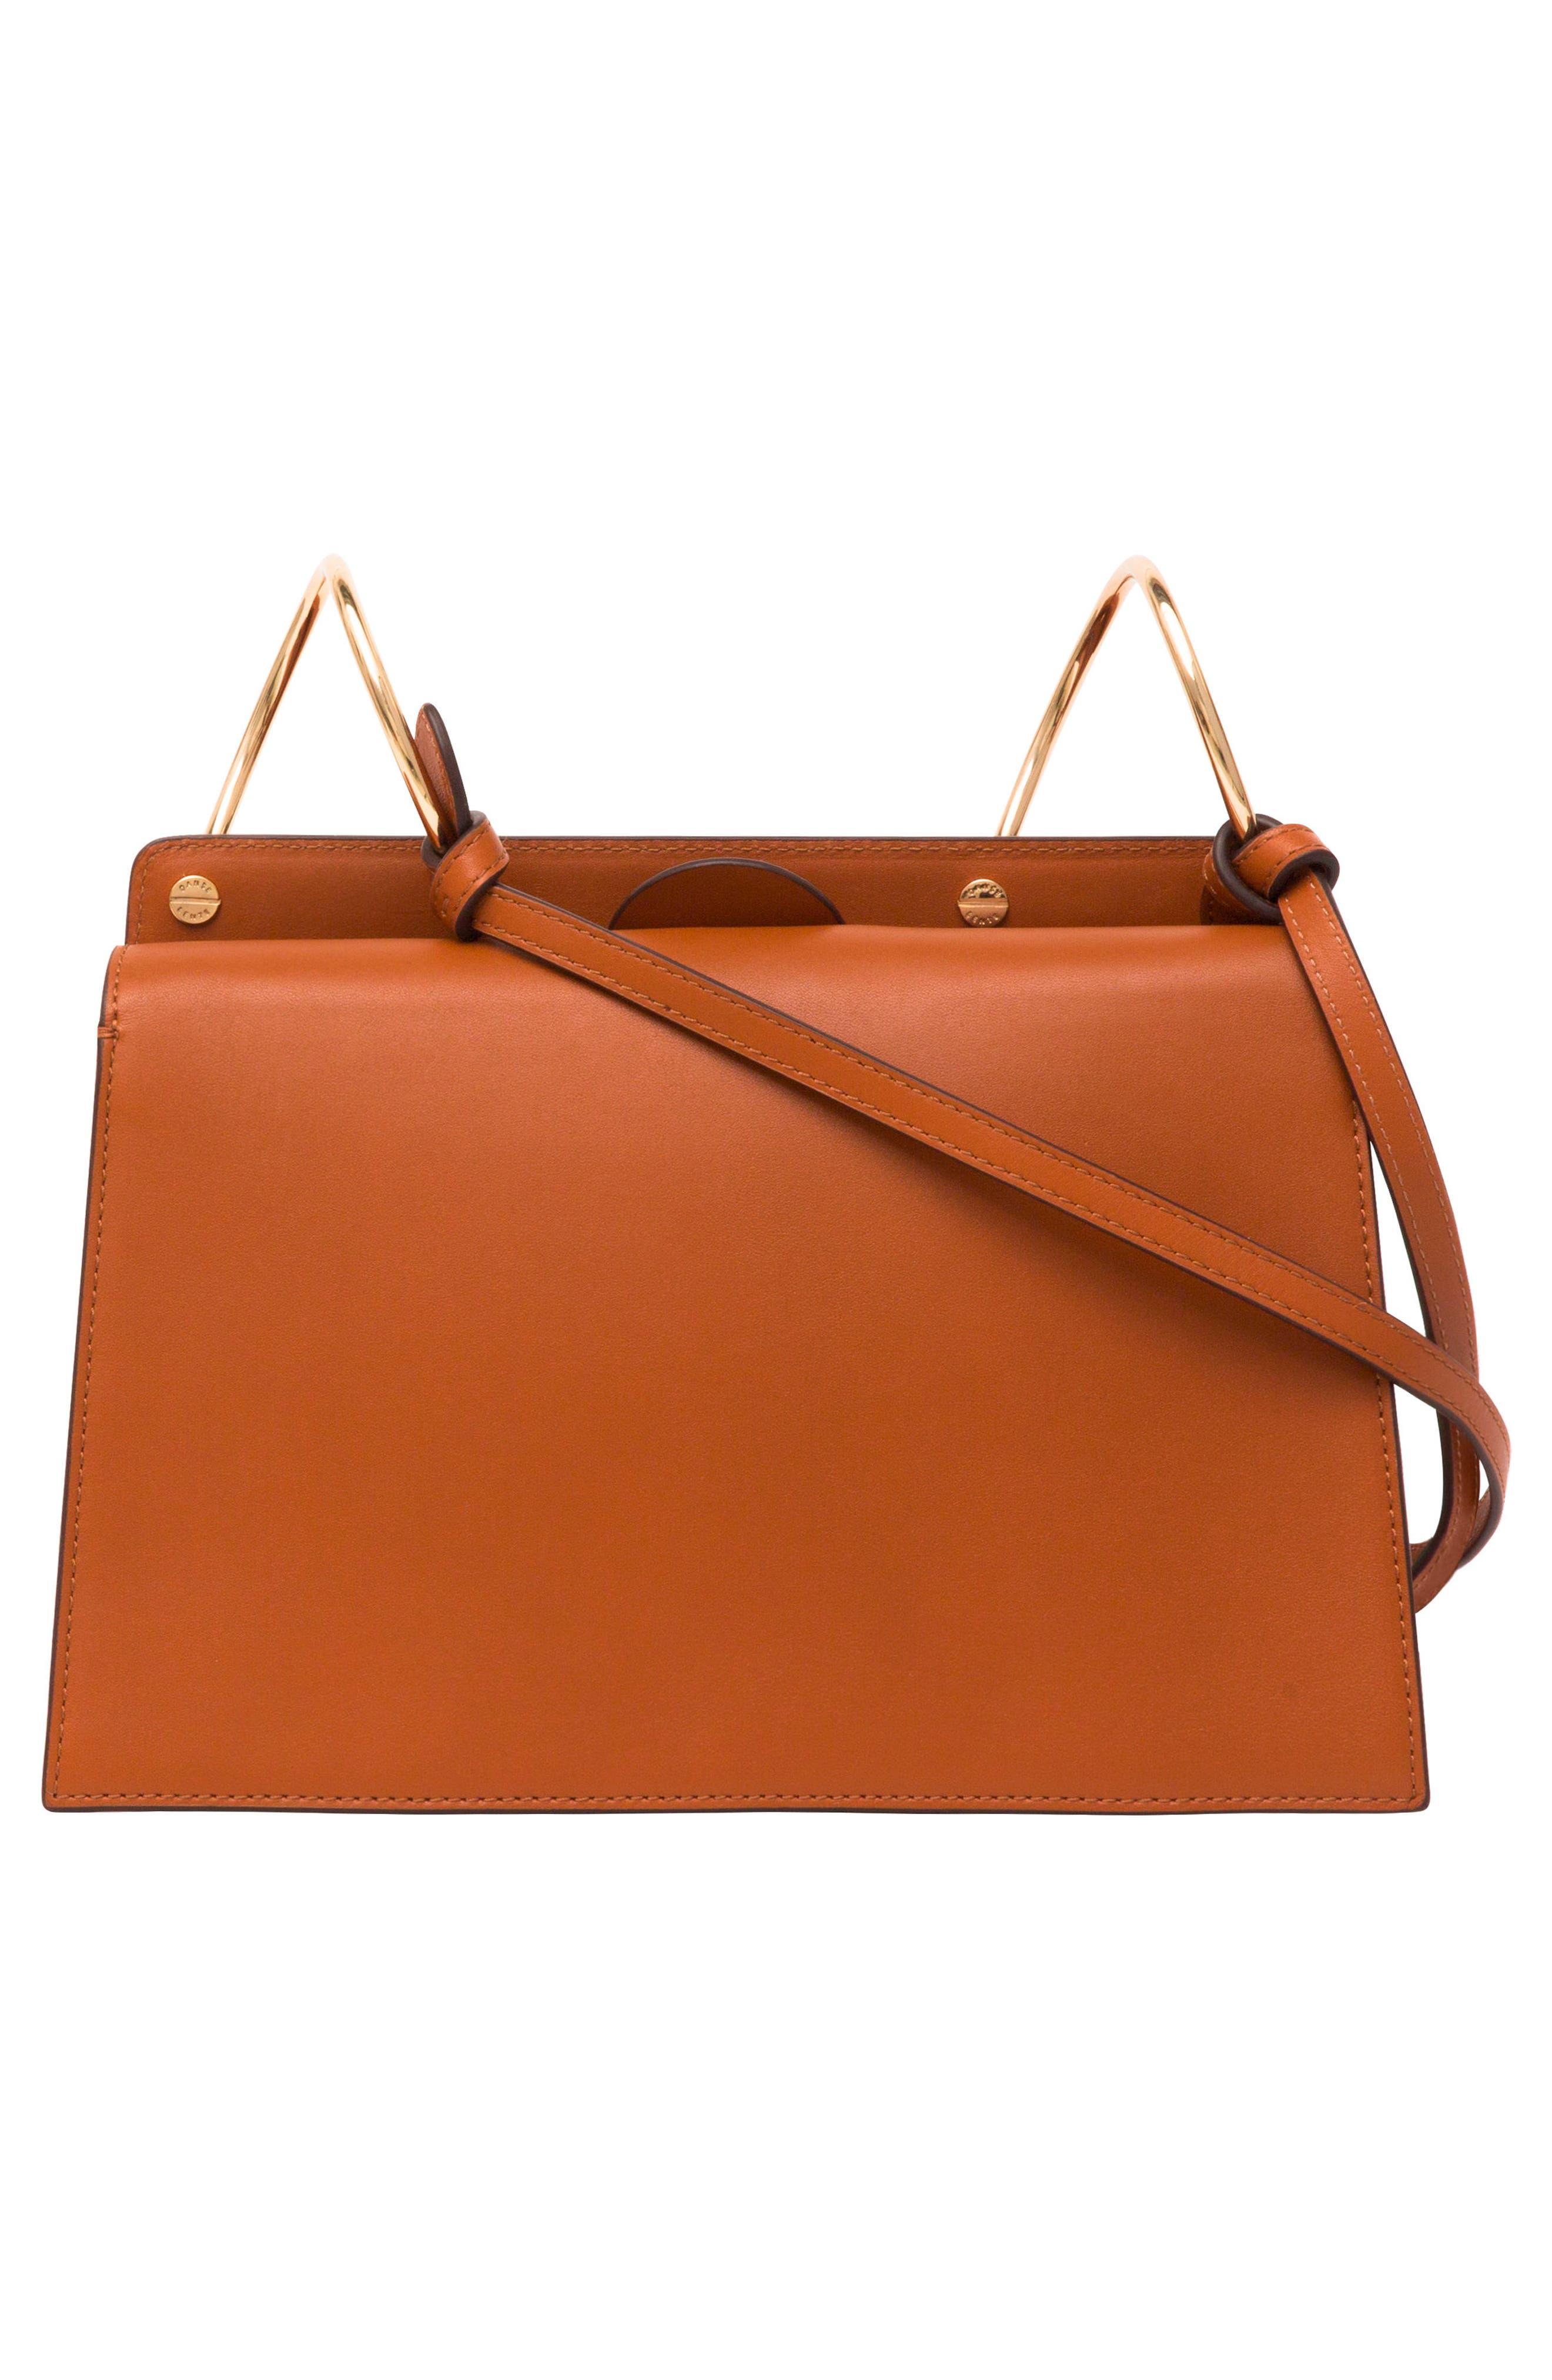 Phoebe Leather Crossbody Bag,                             Alternate thumbnail 4, color,                             SAND/ AMBER